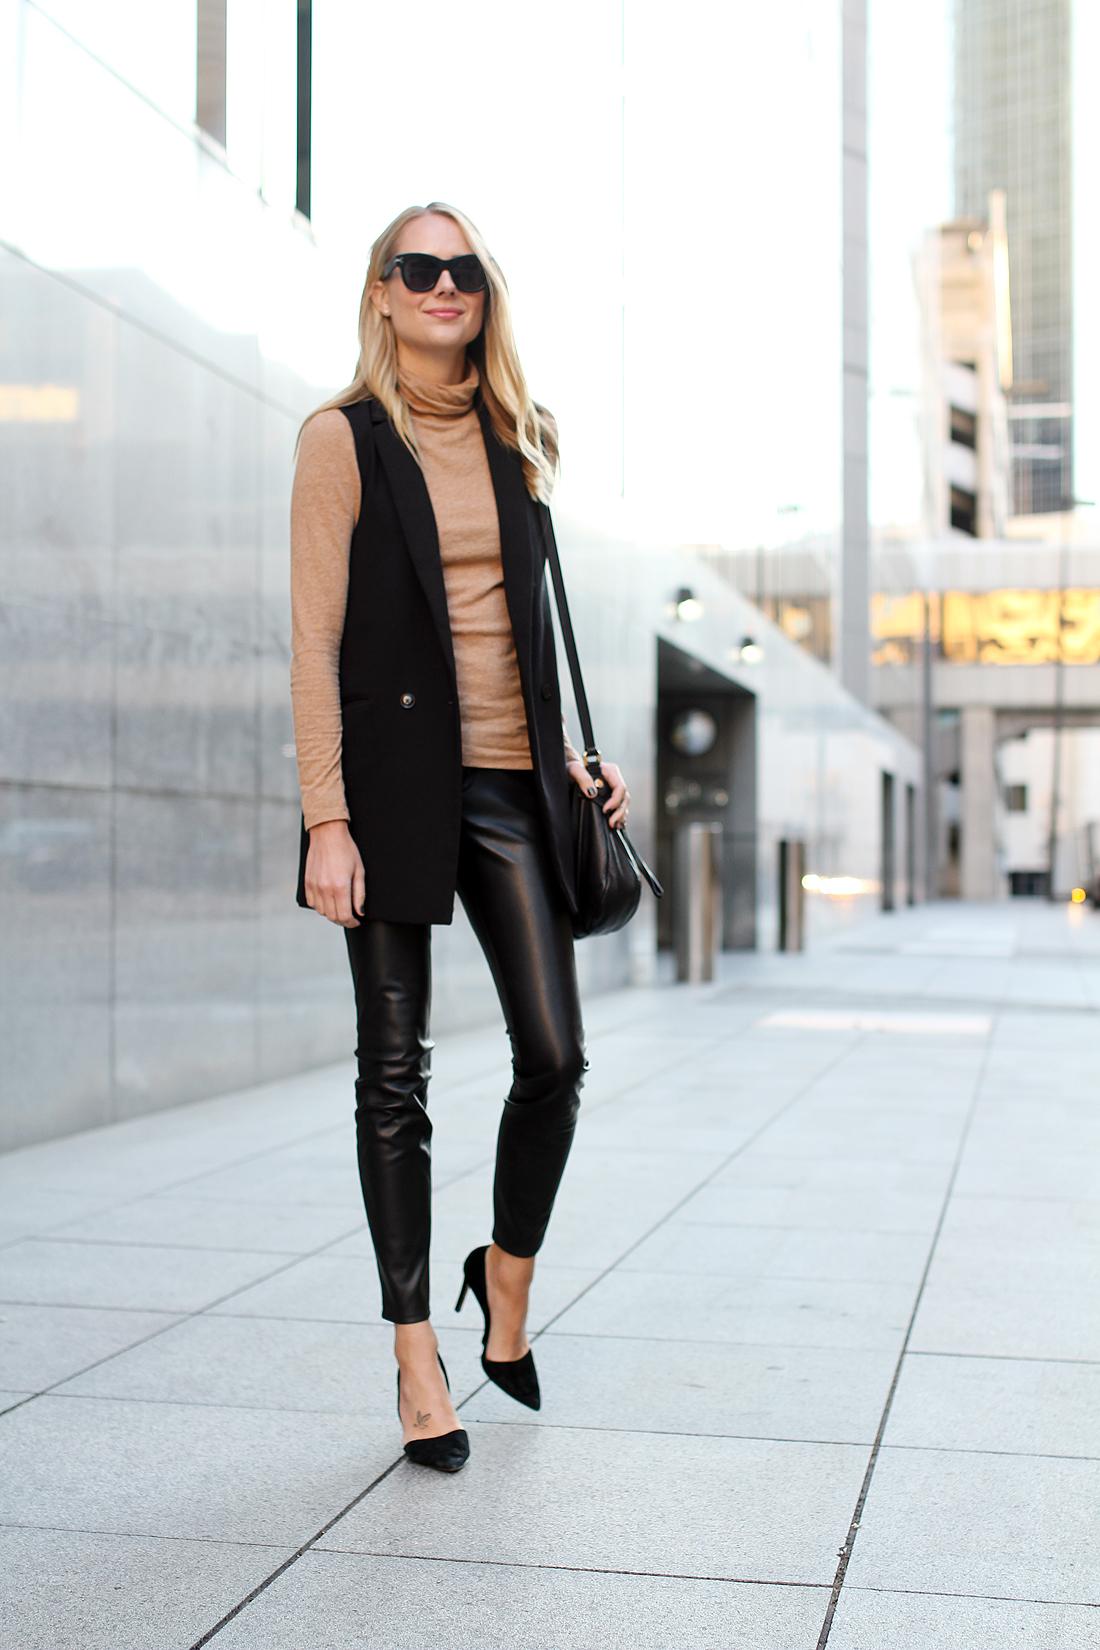 fashion-jackson-celine-sunglasses-madewell-camel-turtleneck-black-long-vest-black-faux-leather-skinny-pants-black-suede-pumps